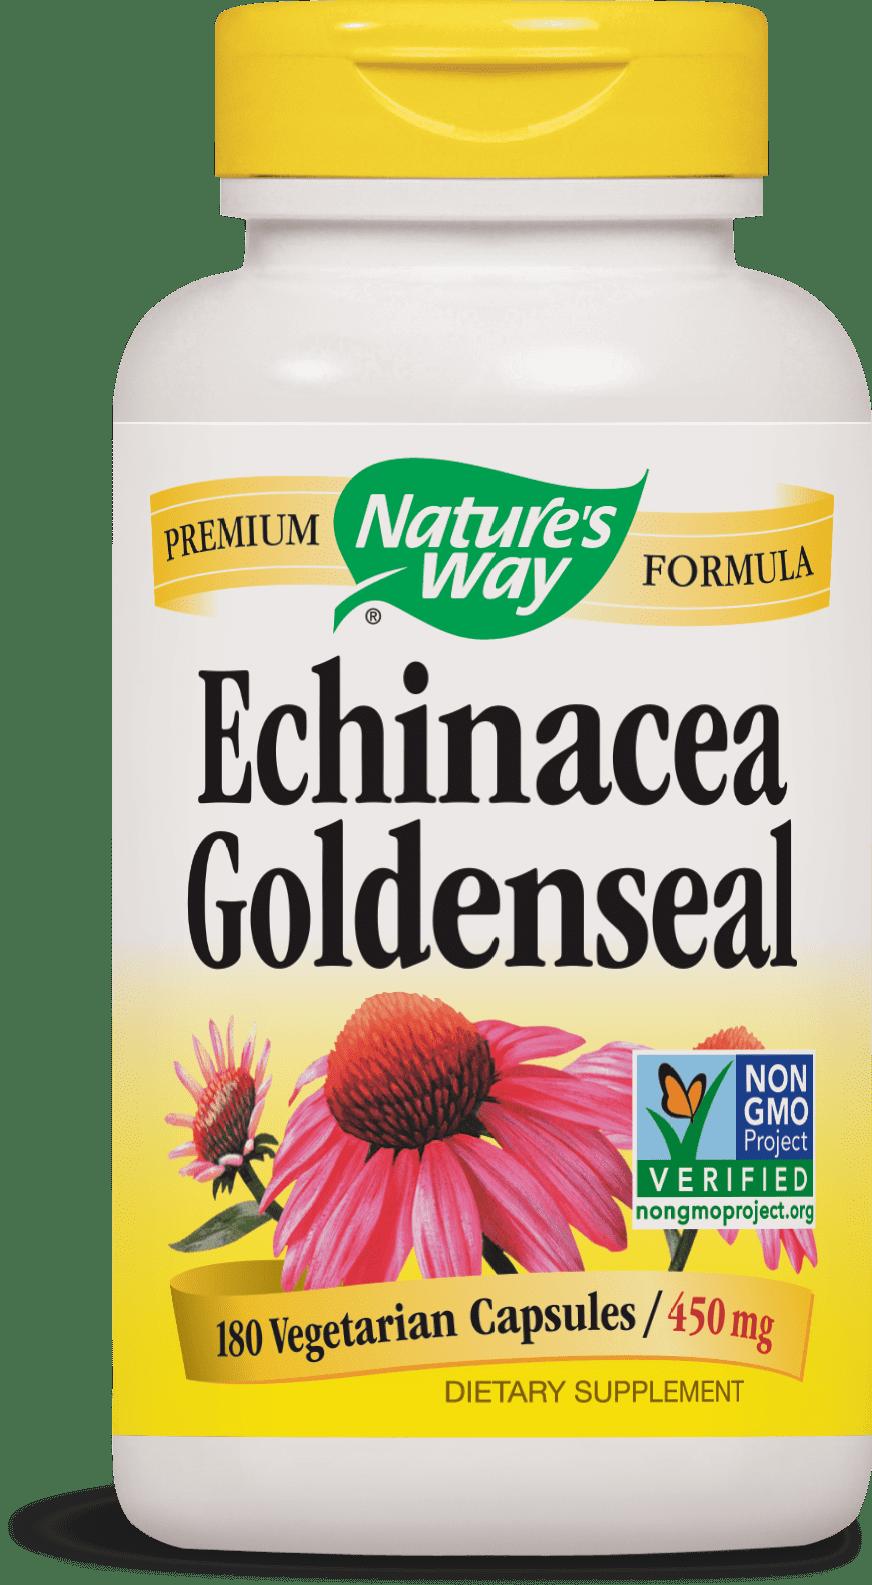 Nature S Way Echinacea Goldenseal Non Gmo Project Verified Tru Id